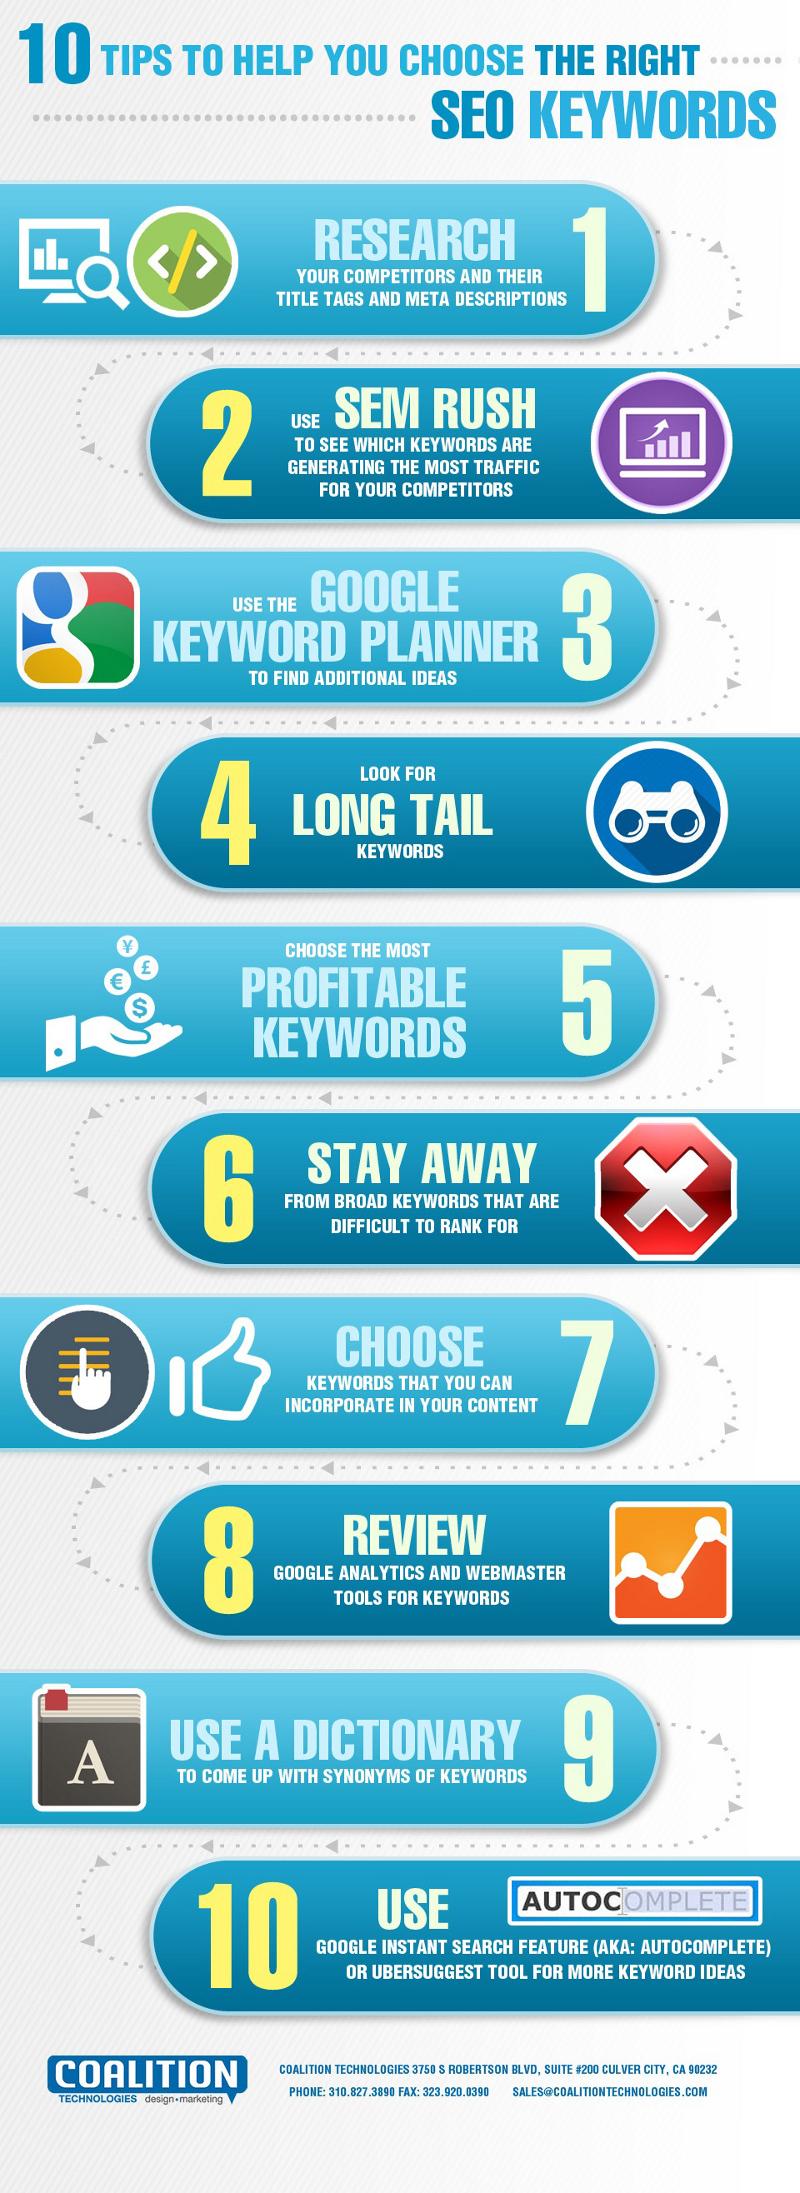 Tips to SEO Keywords